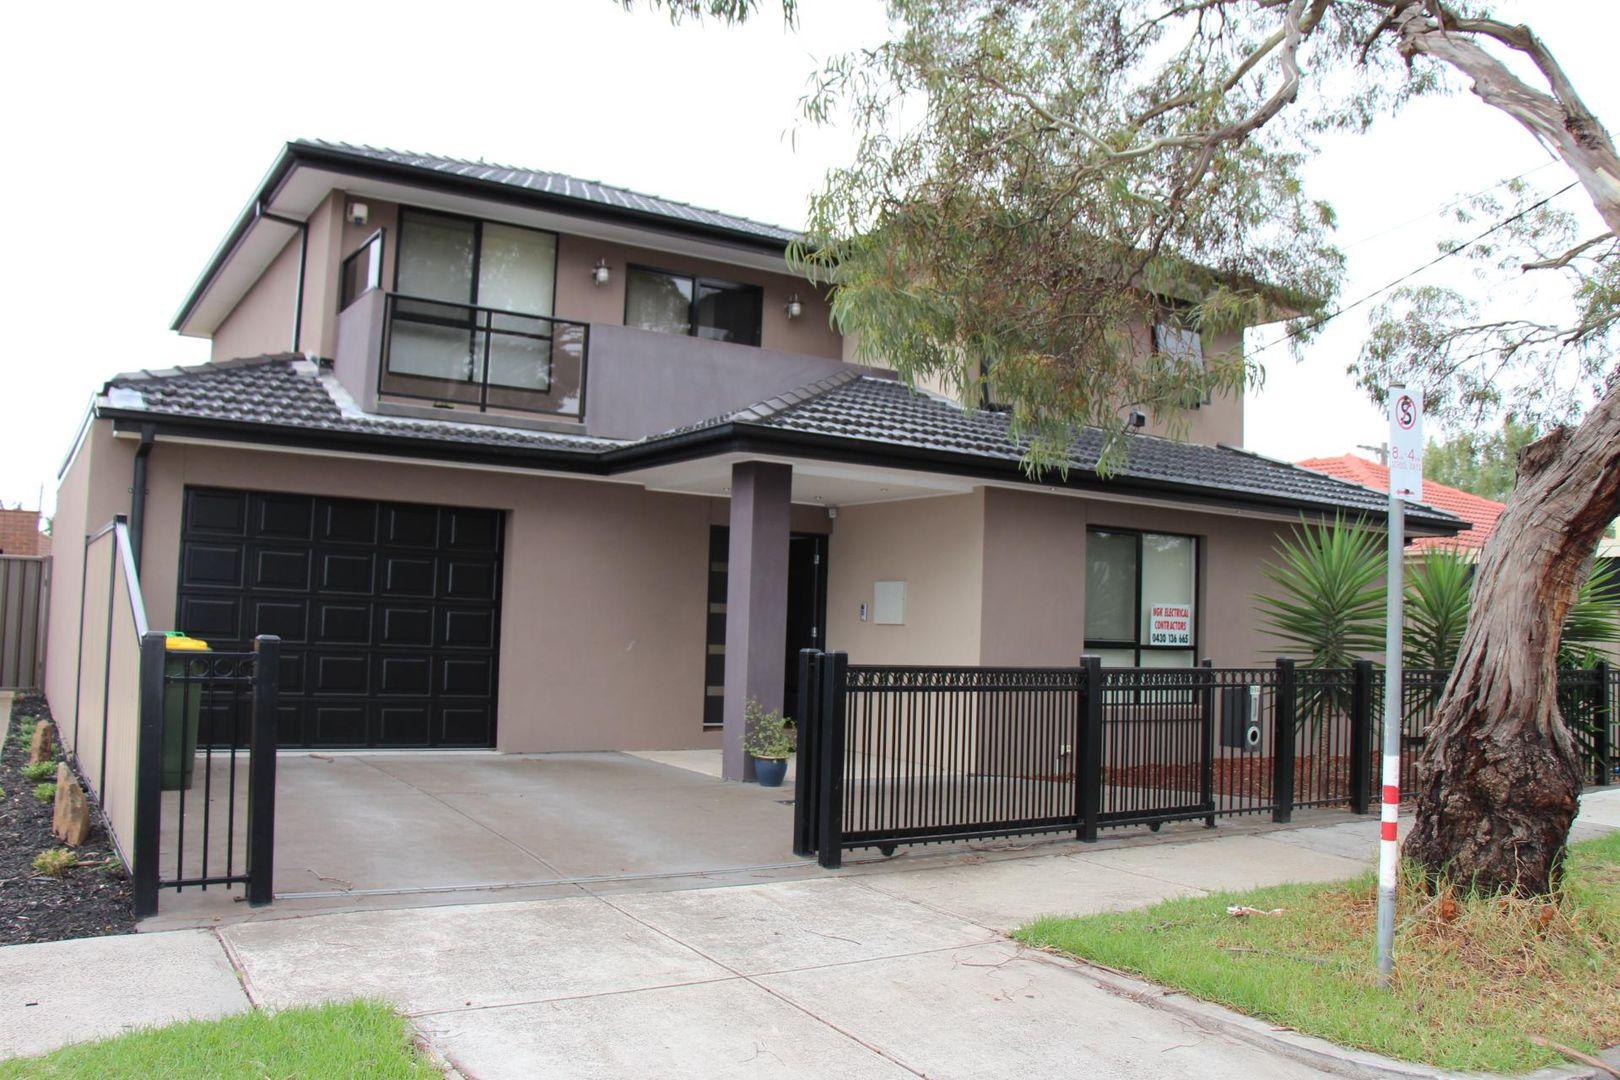 3 bedrooms House in 99A Seventh Avenue ALTONA NORTH VIC, 3025